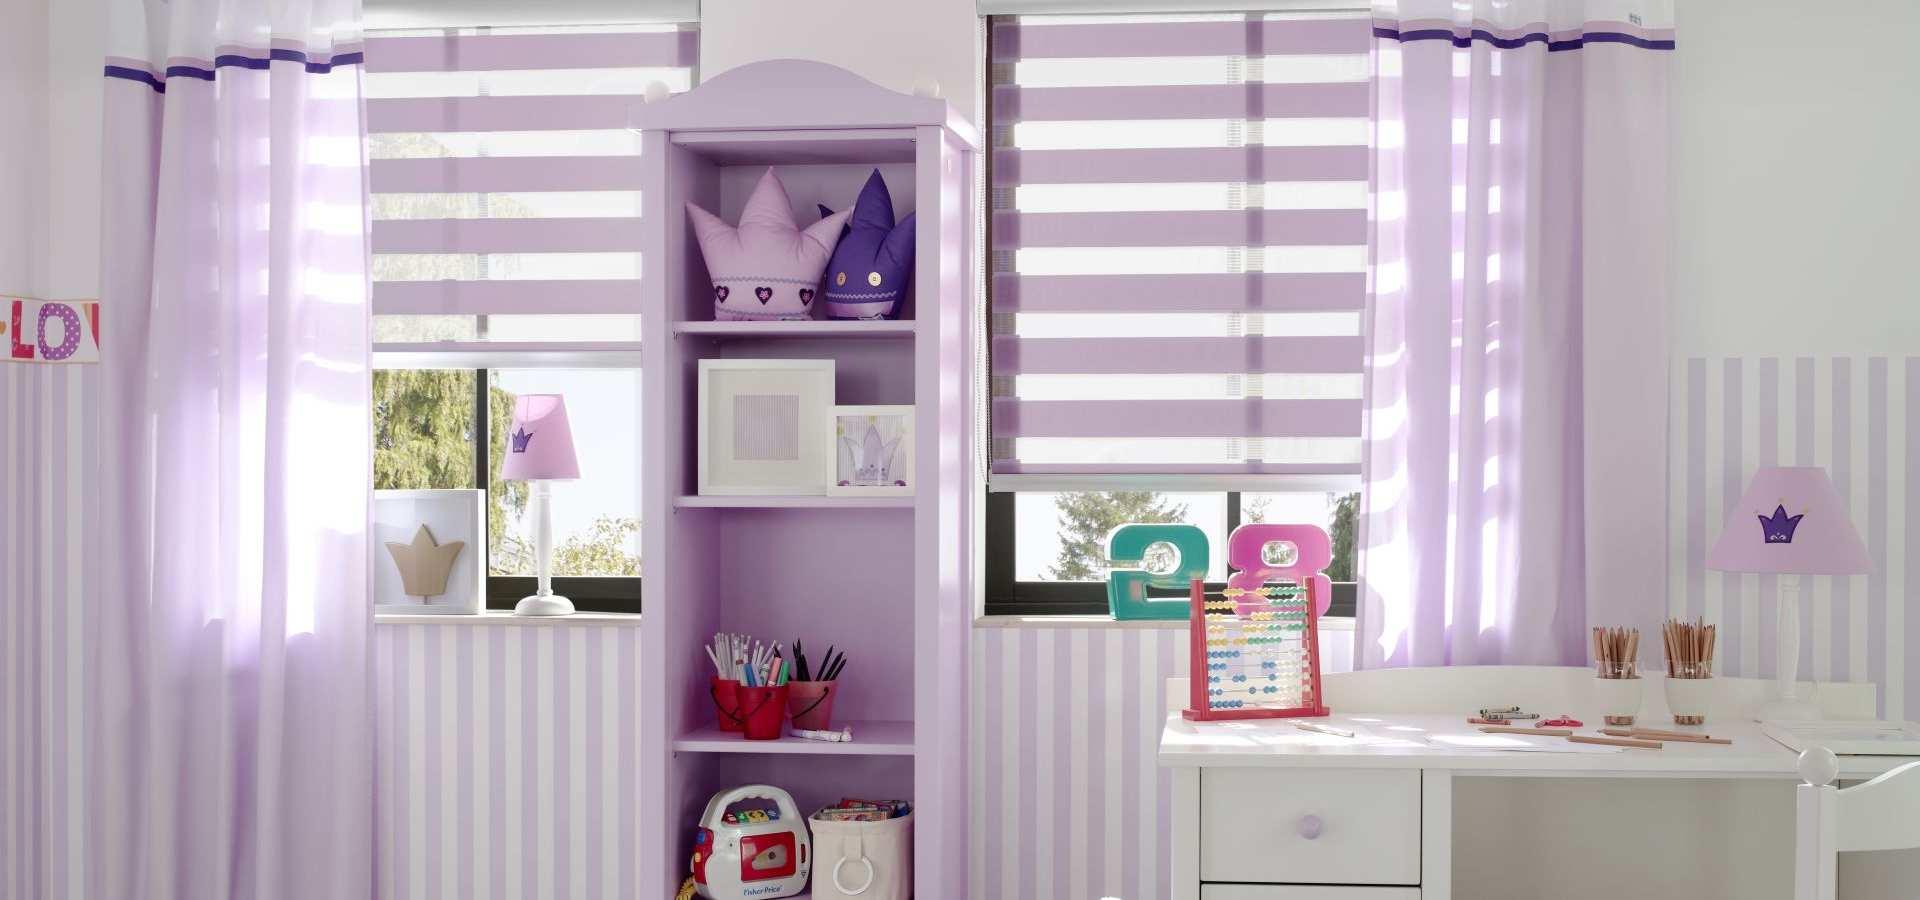 Bild Kinderzimmer Rollos lila